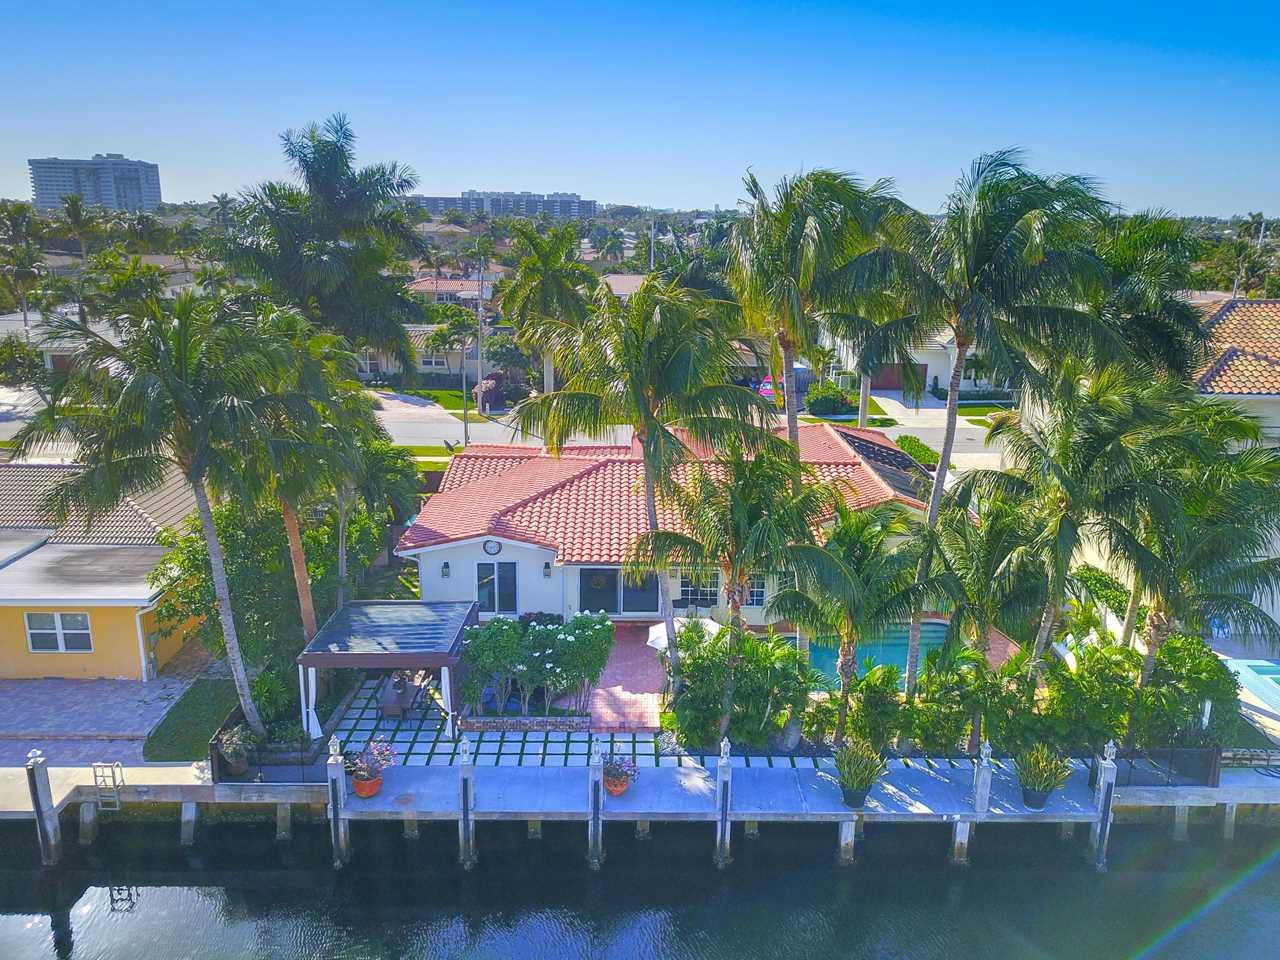 811 NE 69 Street Boca Raton, FL 33487 - MLS# RX-10491223 | BocaRatonRealEstate.com Photo 1